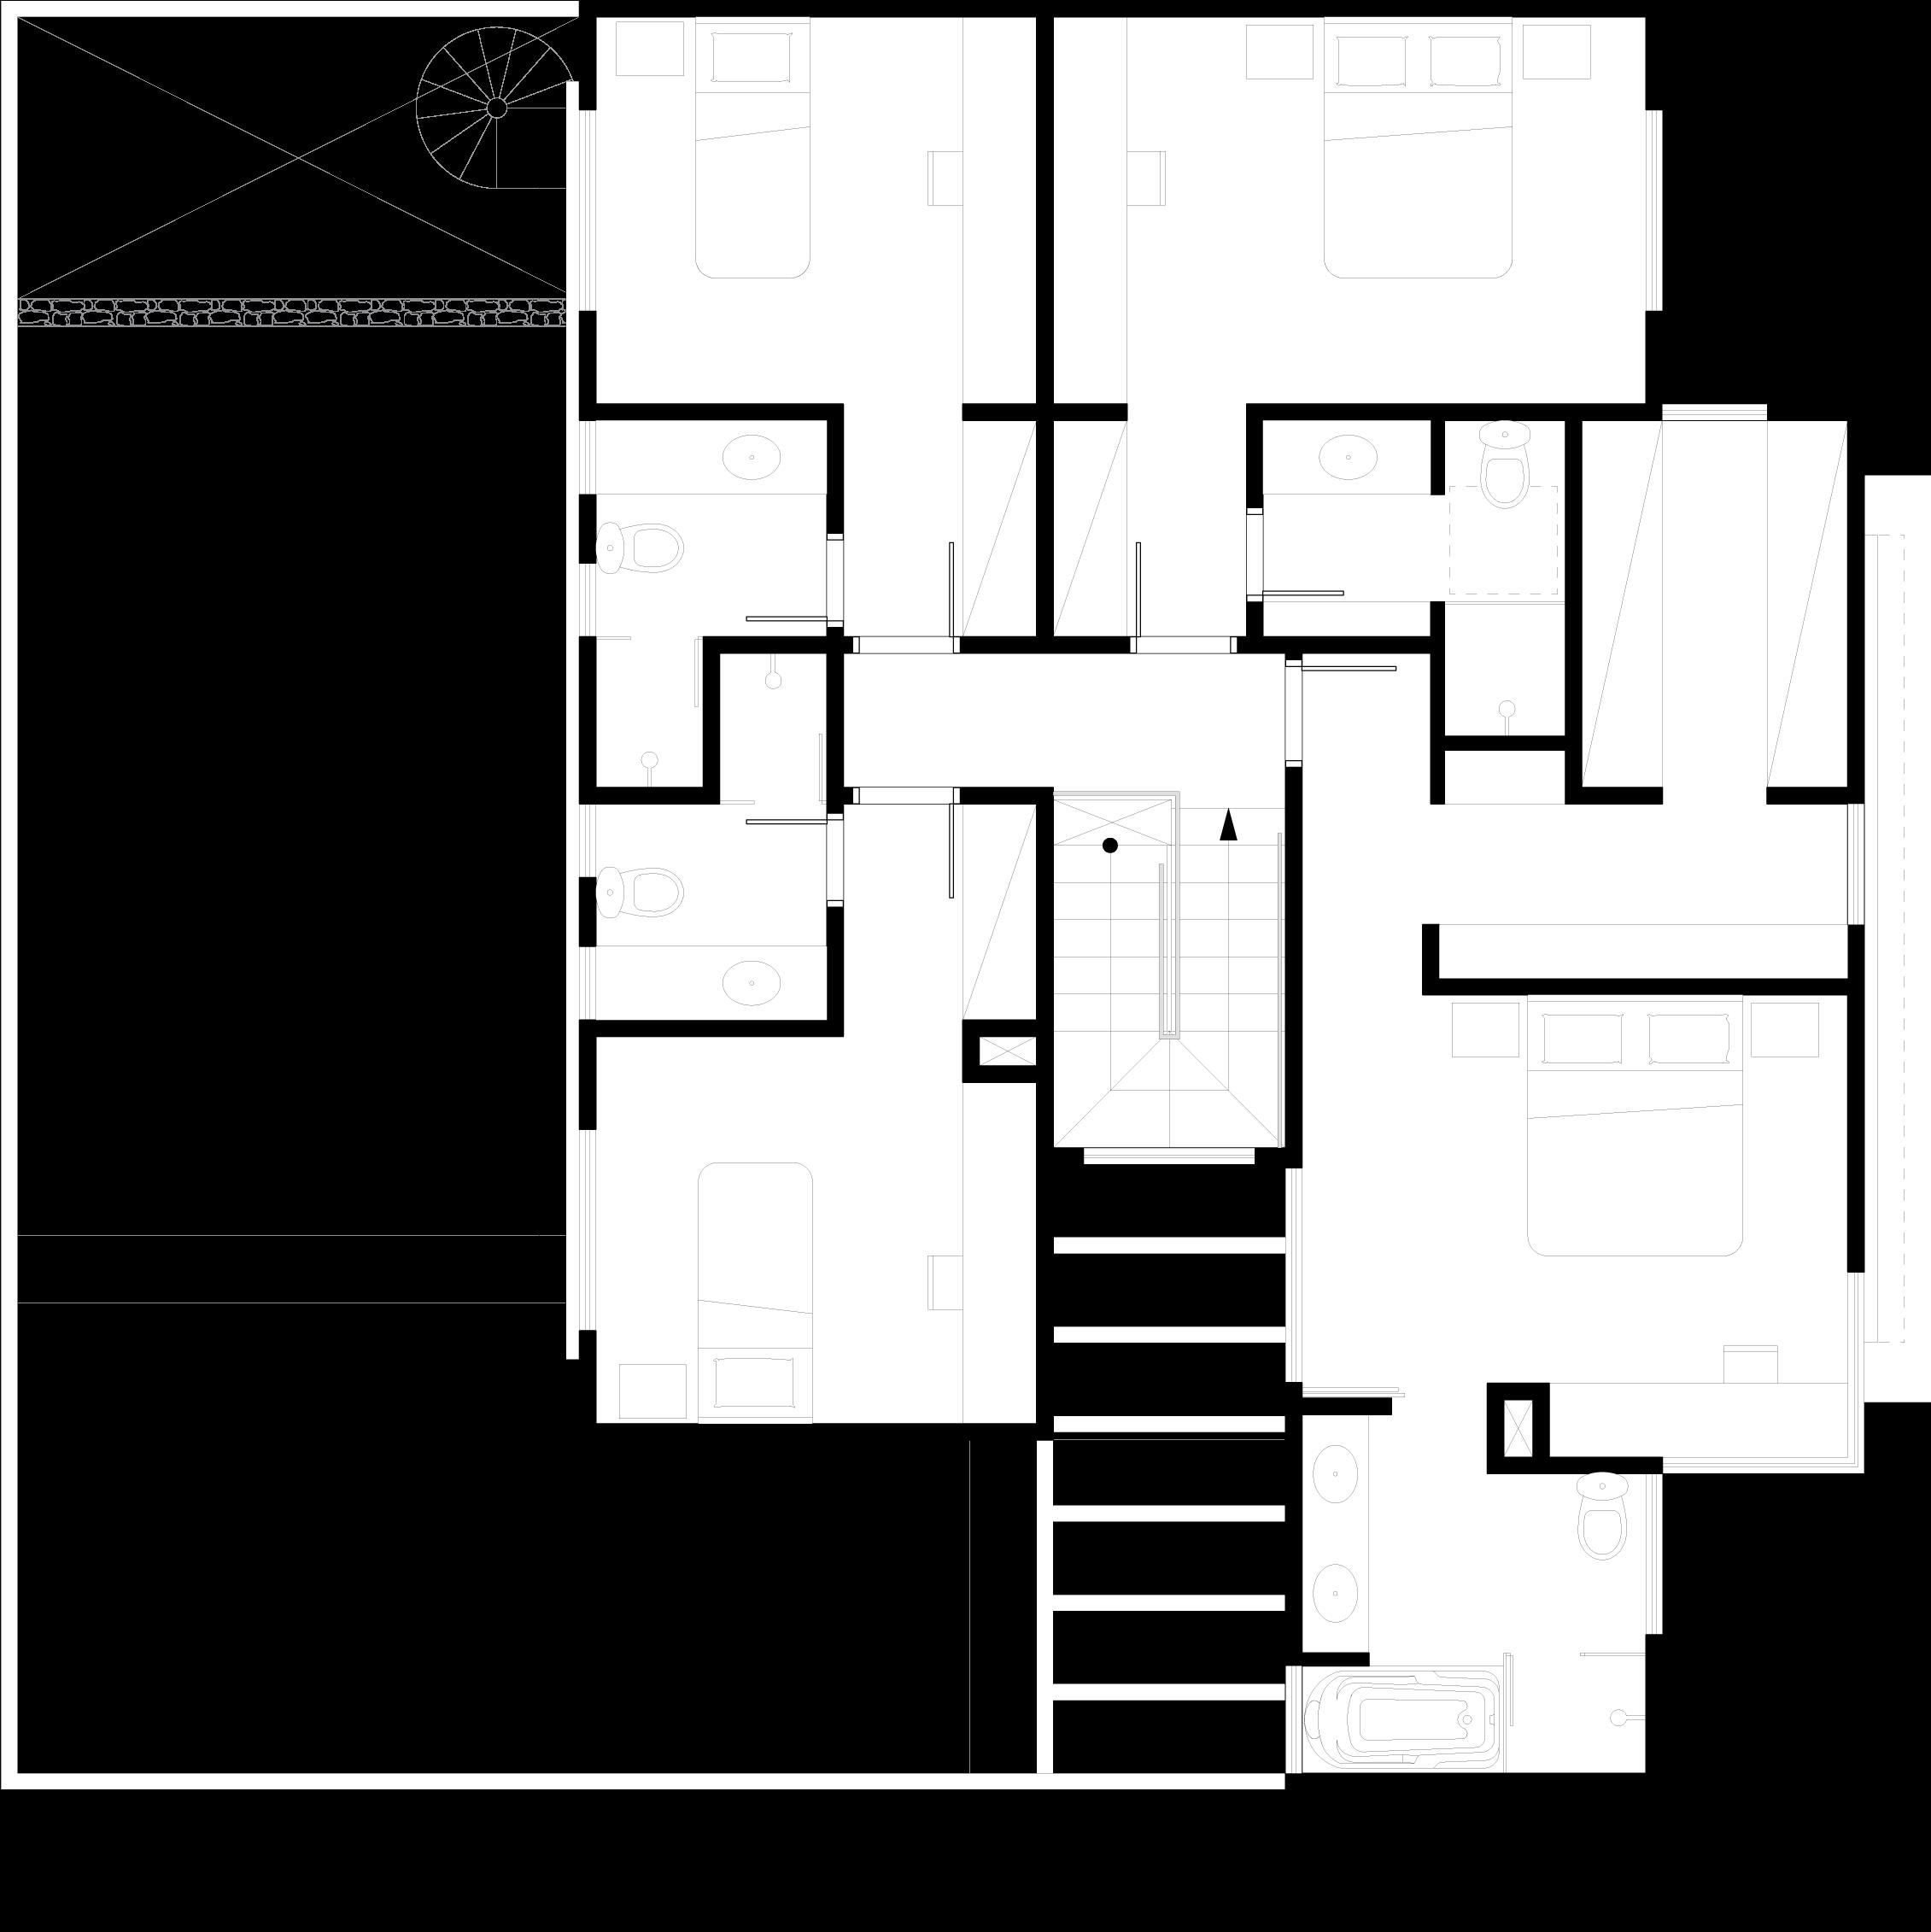 PessoaArquitetos_05-1º PAVTO2 [Converted]